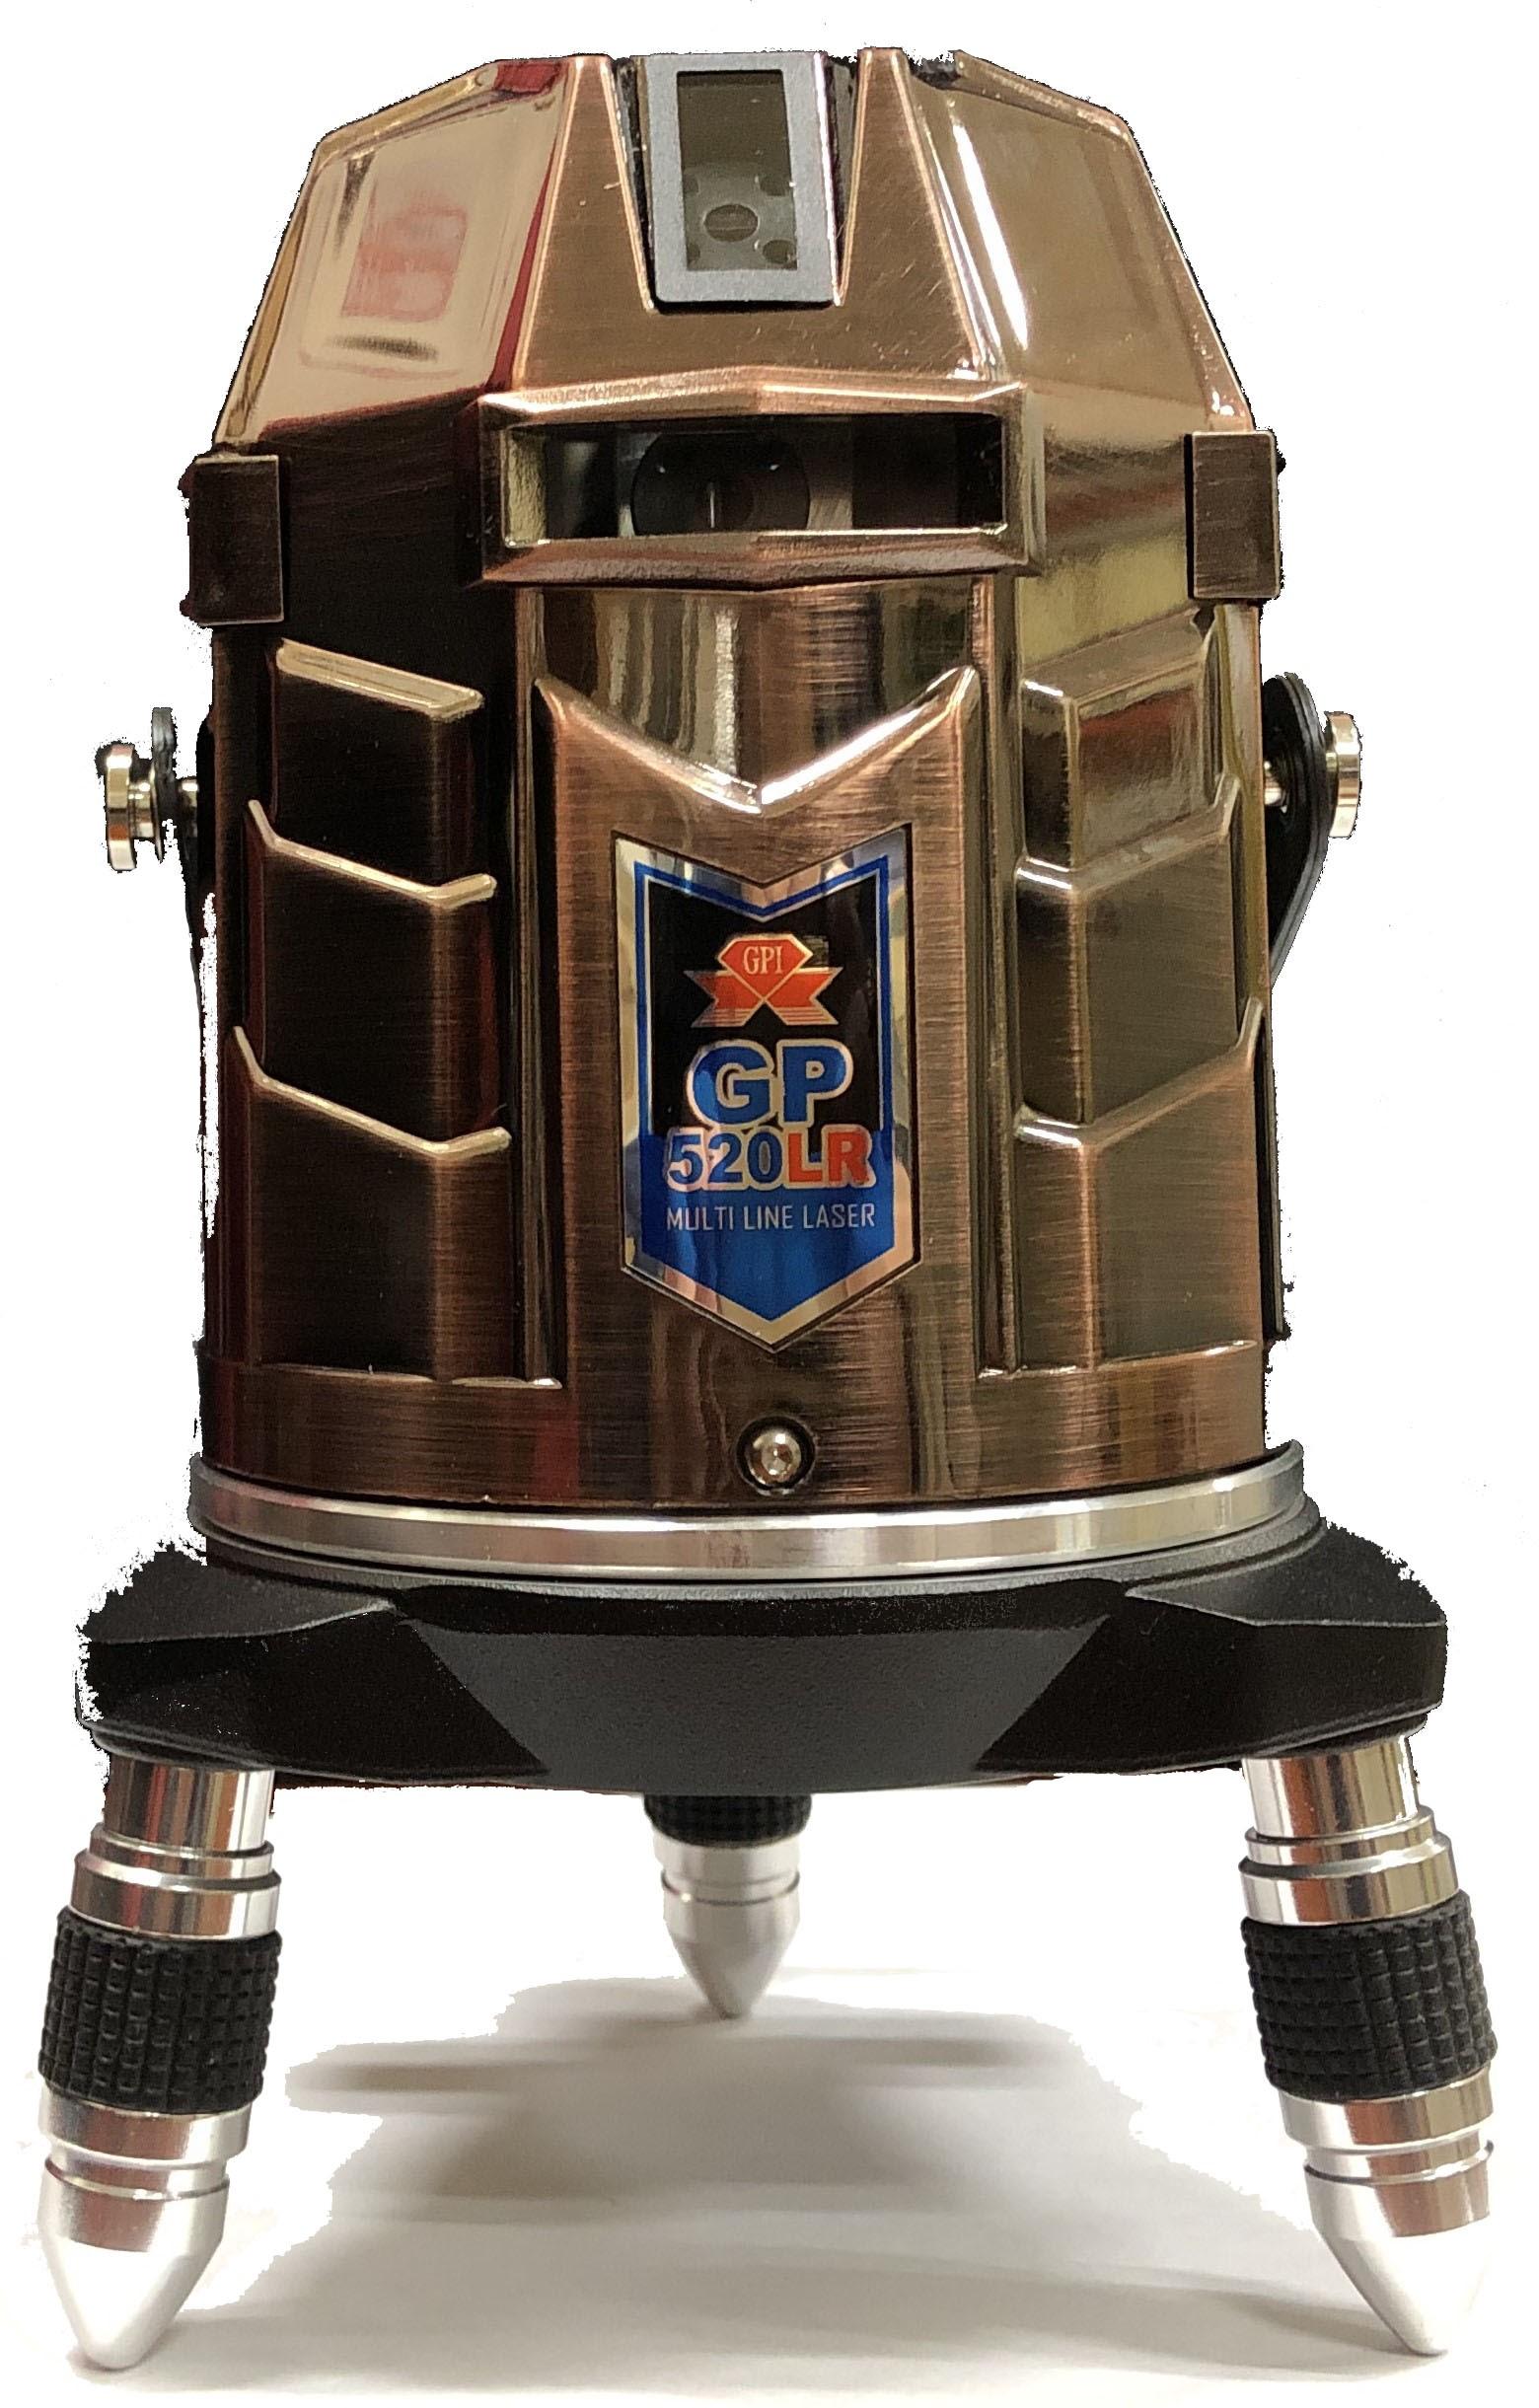 GP-520LR(強紅光)